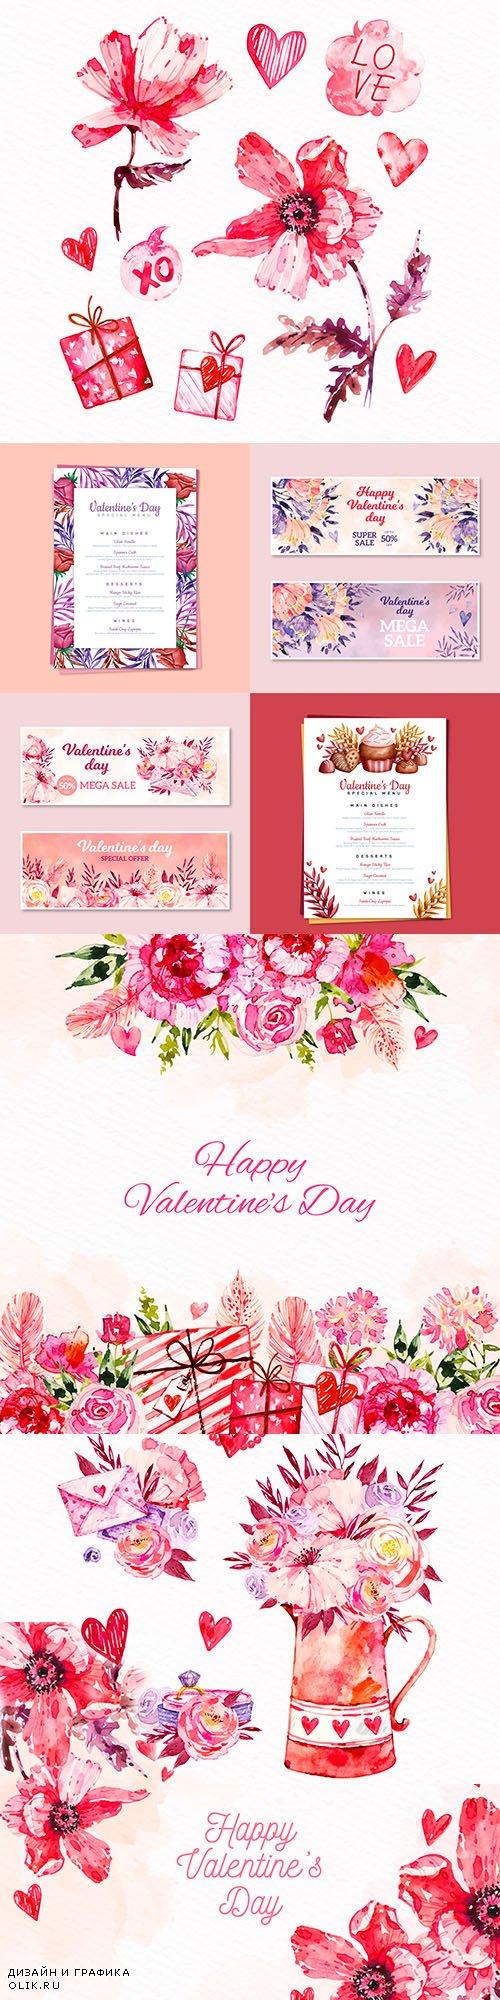 Valentine's Day romantic watercolor decorative illustrations 11